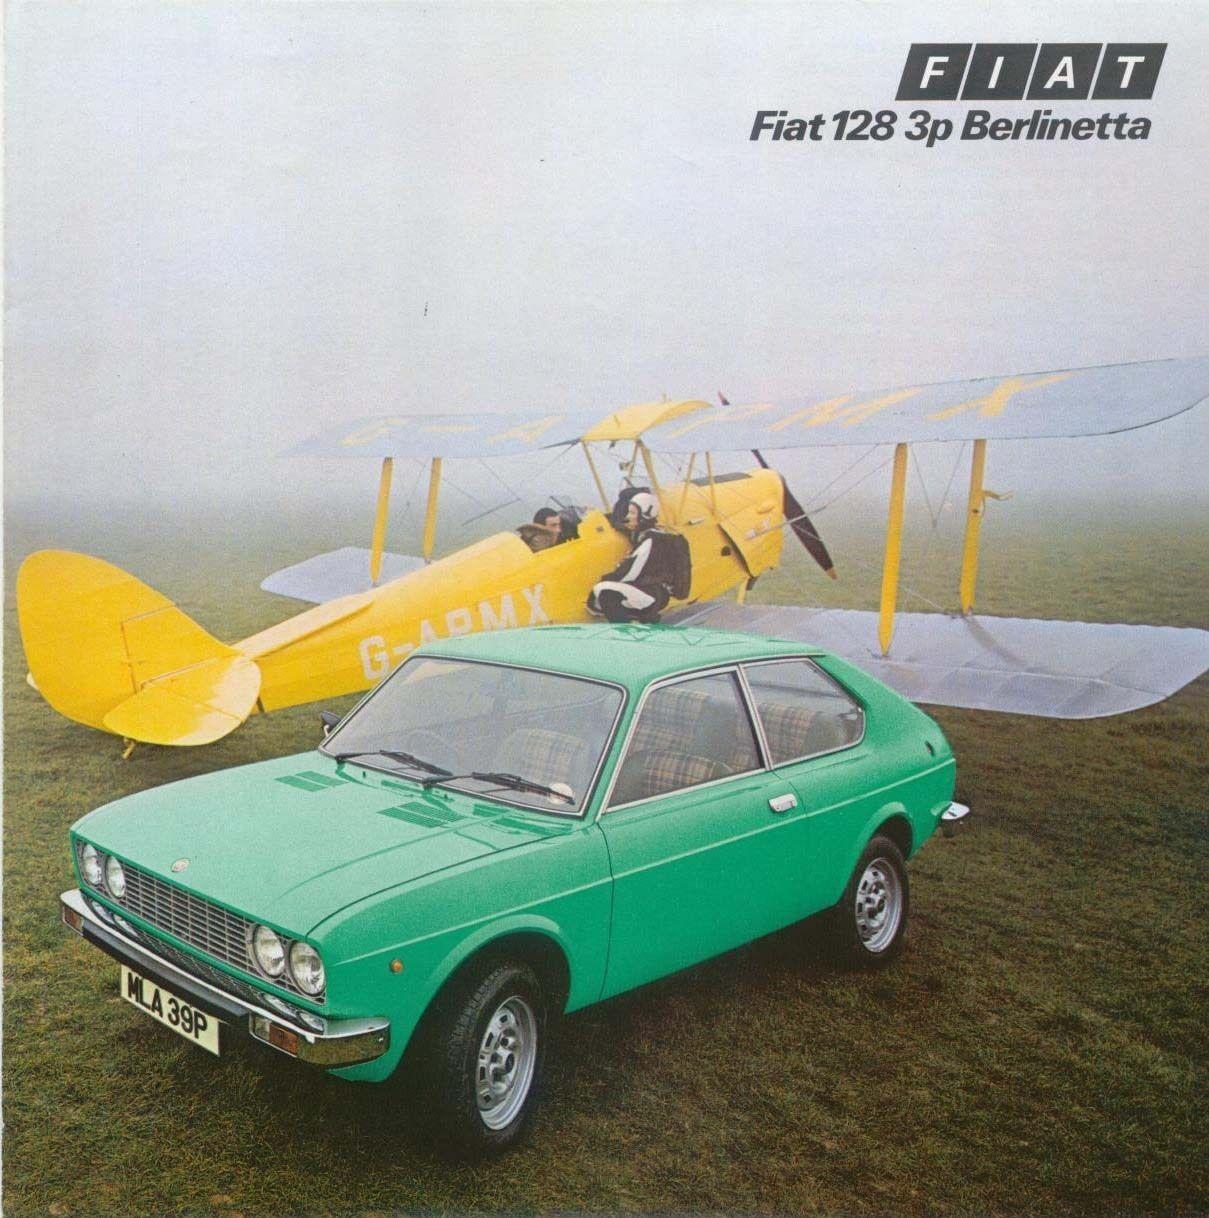 Fiat 128 Coupe Fiat 128 Fiat Cars Fiat